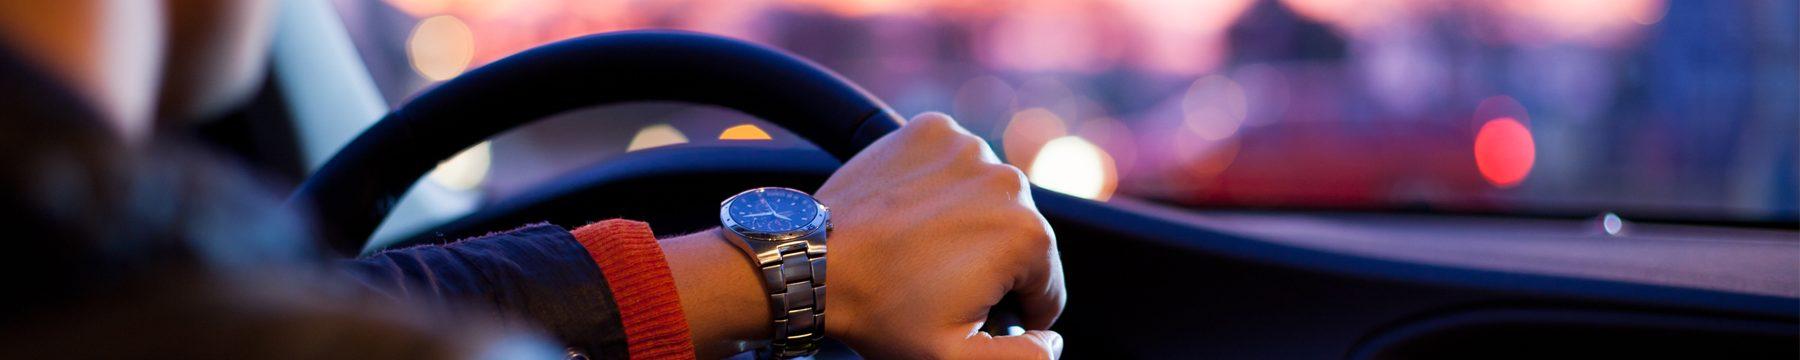 Brisbane Executive Transfers Chauffeurs